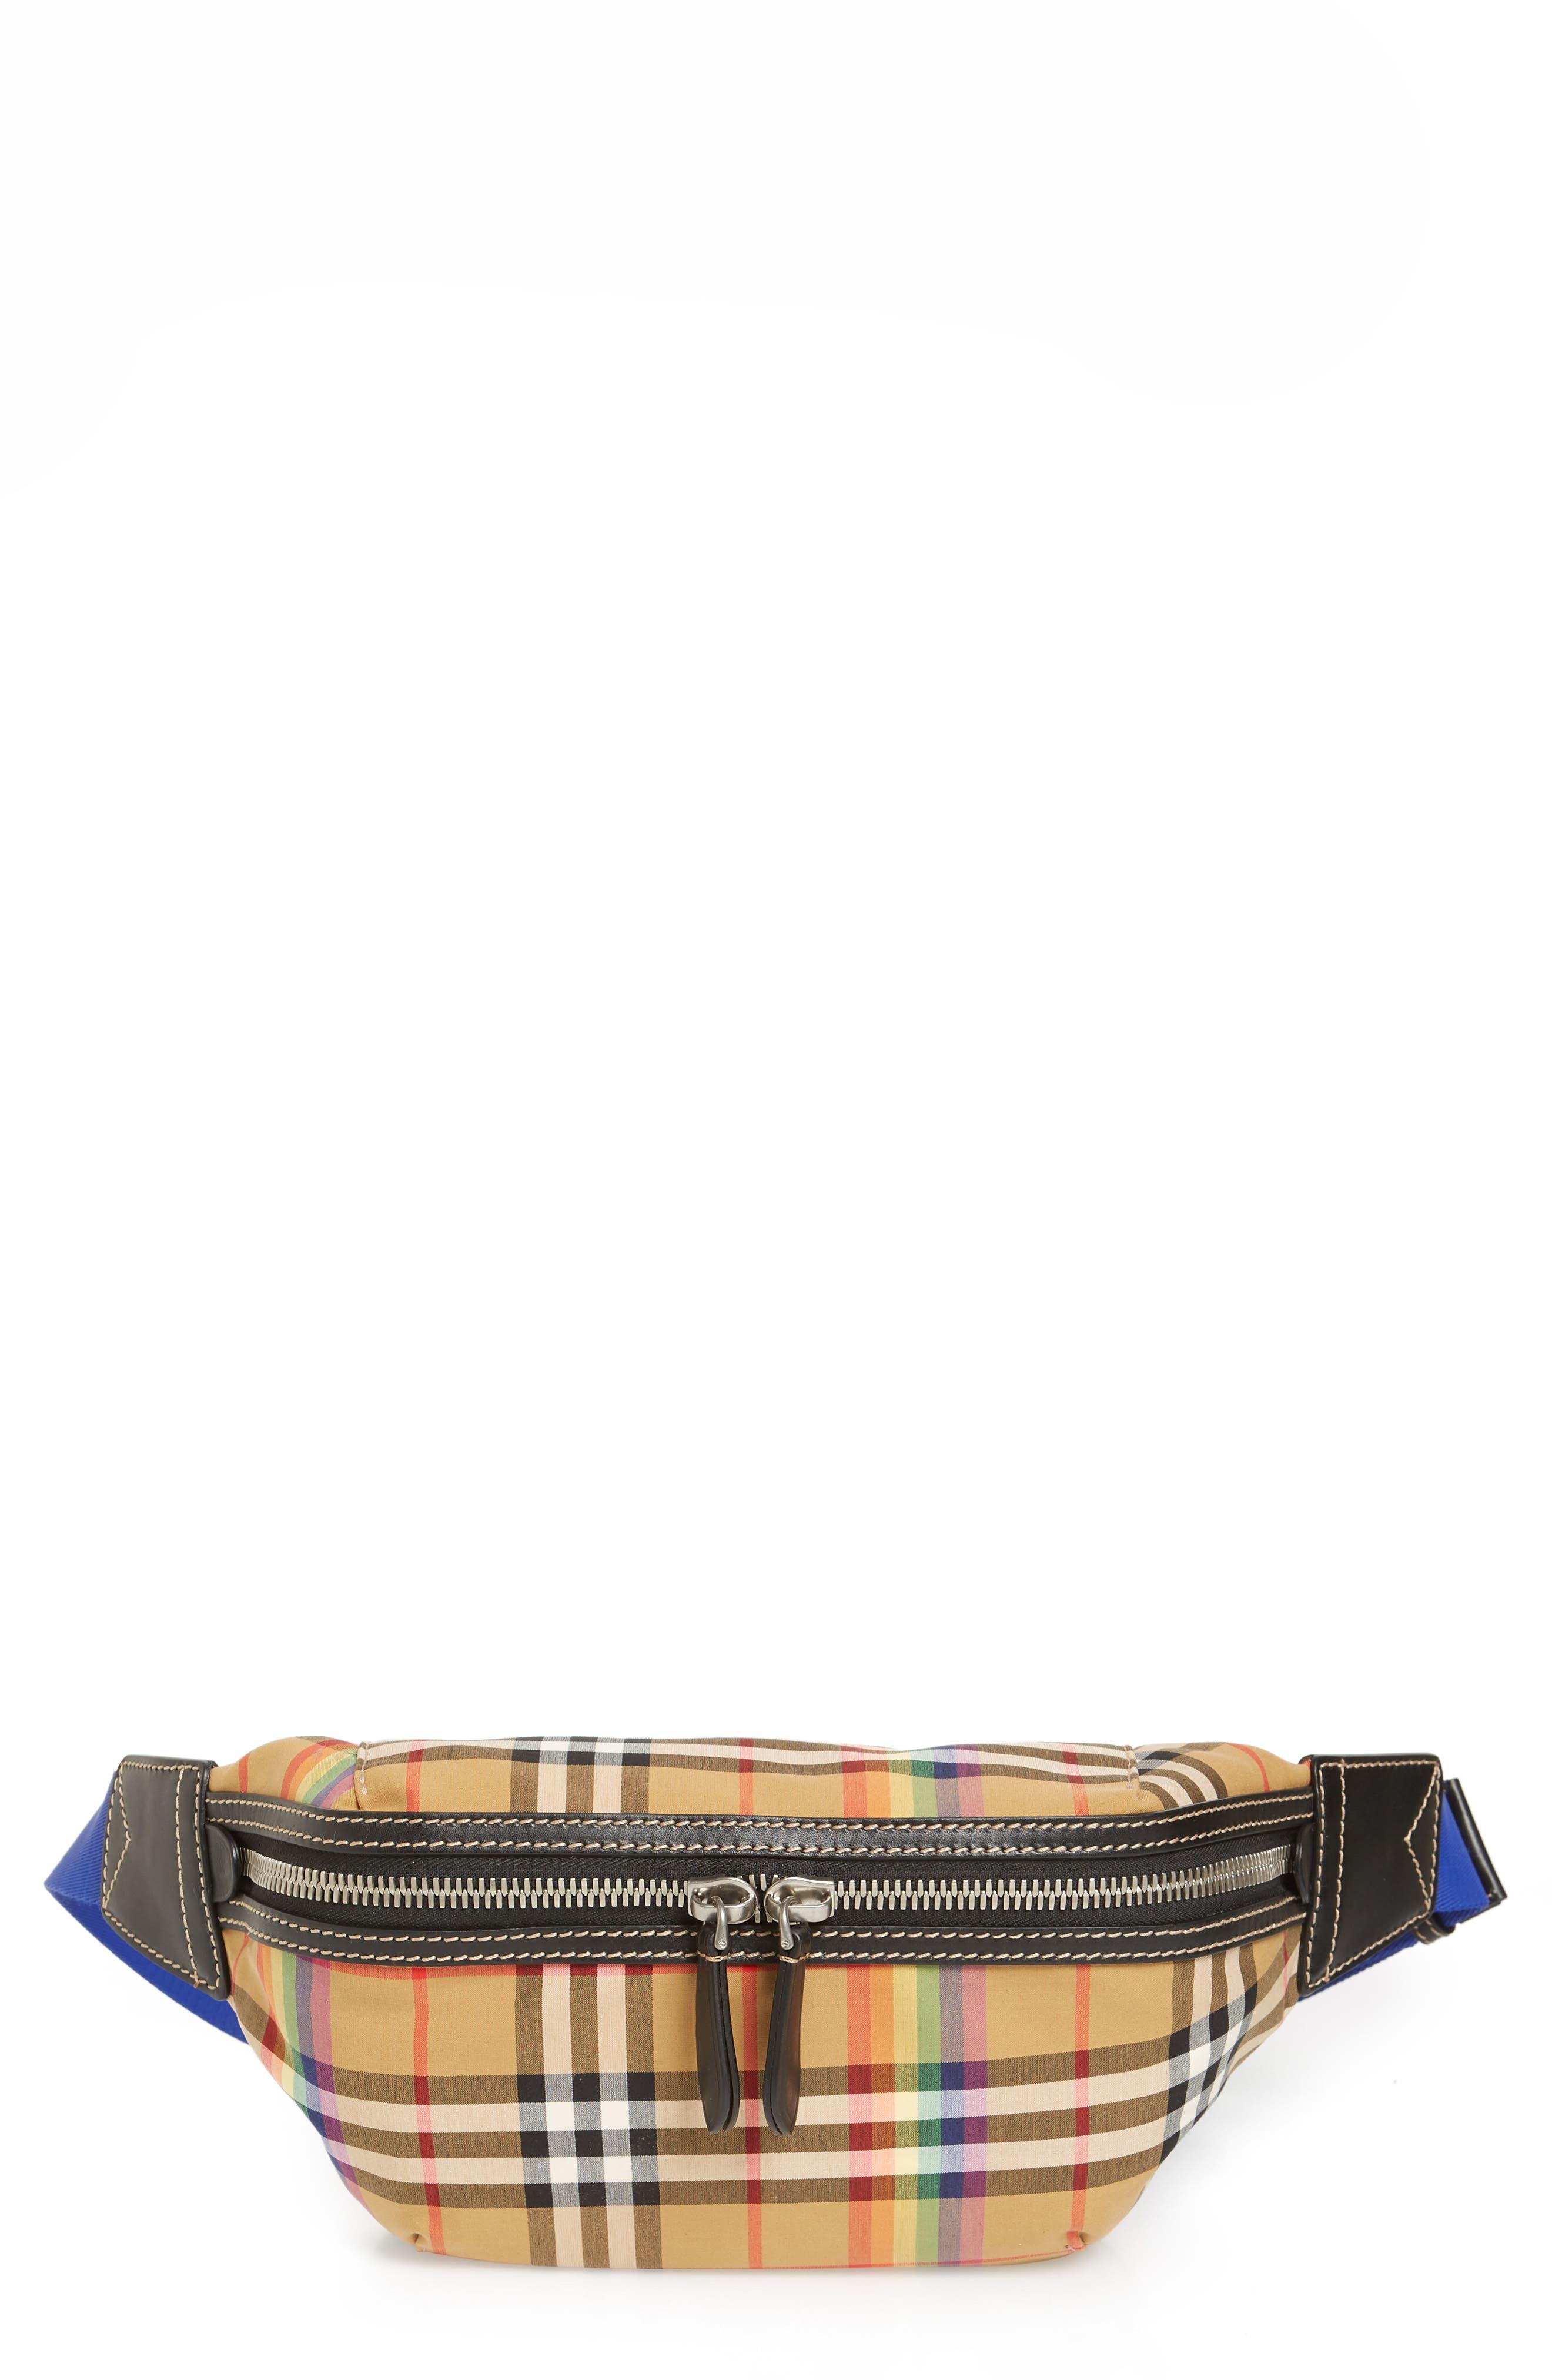 Medium Sonny Vintage Check Bum Bag,                             Main thumbnail 1, color,                             250